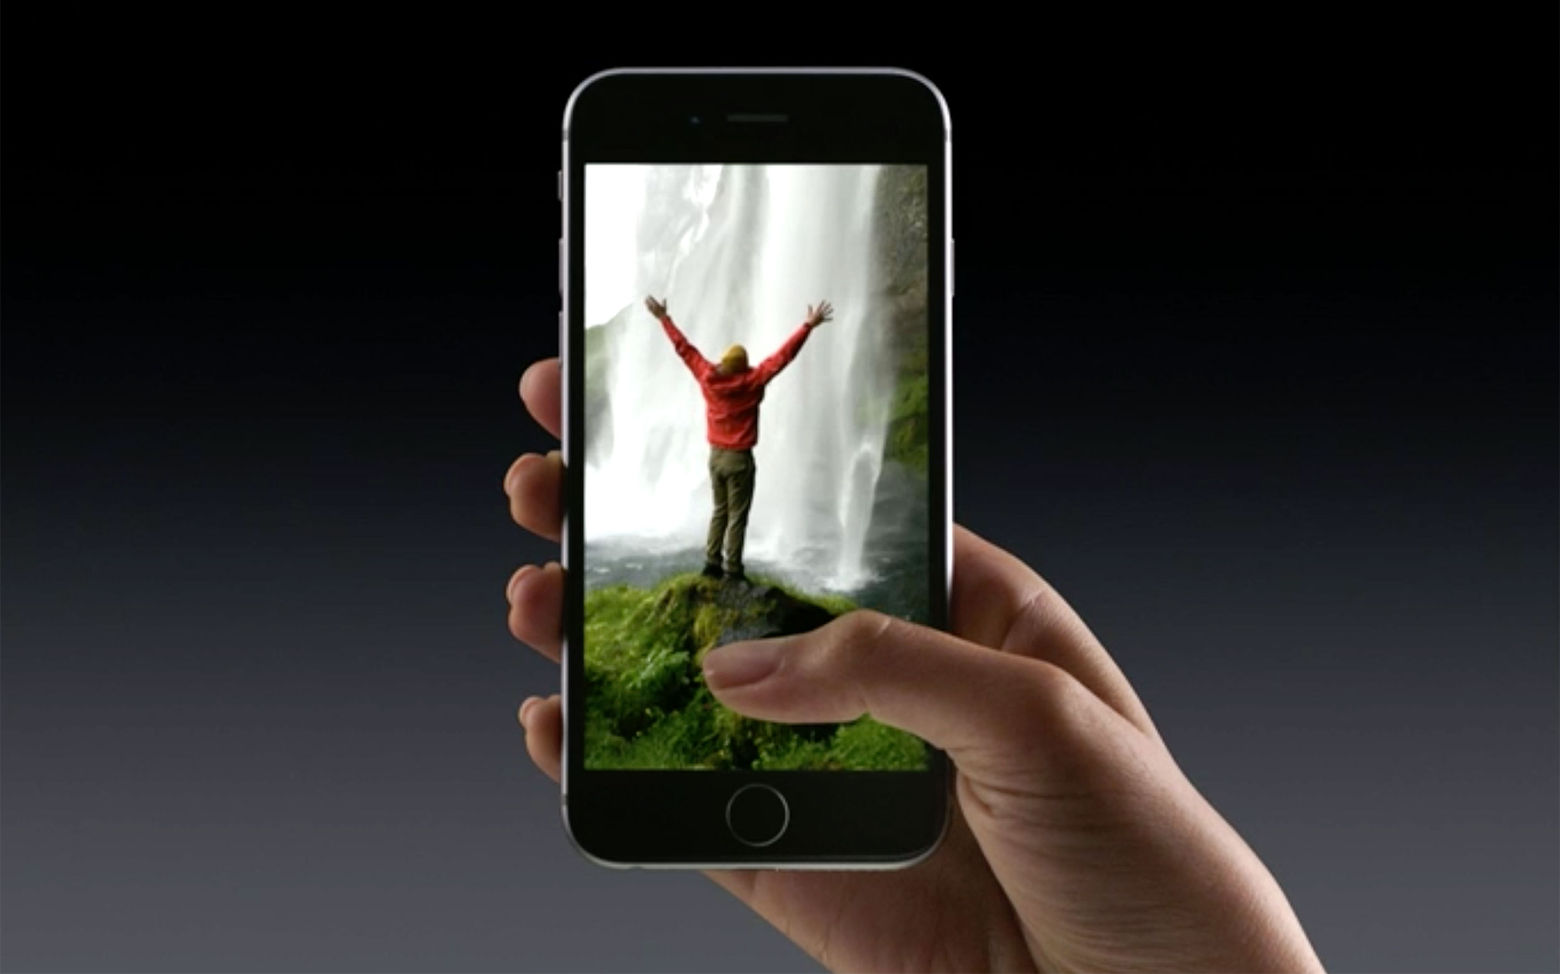 шерсти, кашемира все про живое фото на айфон покорил